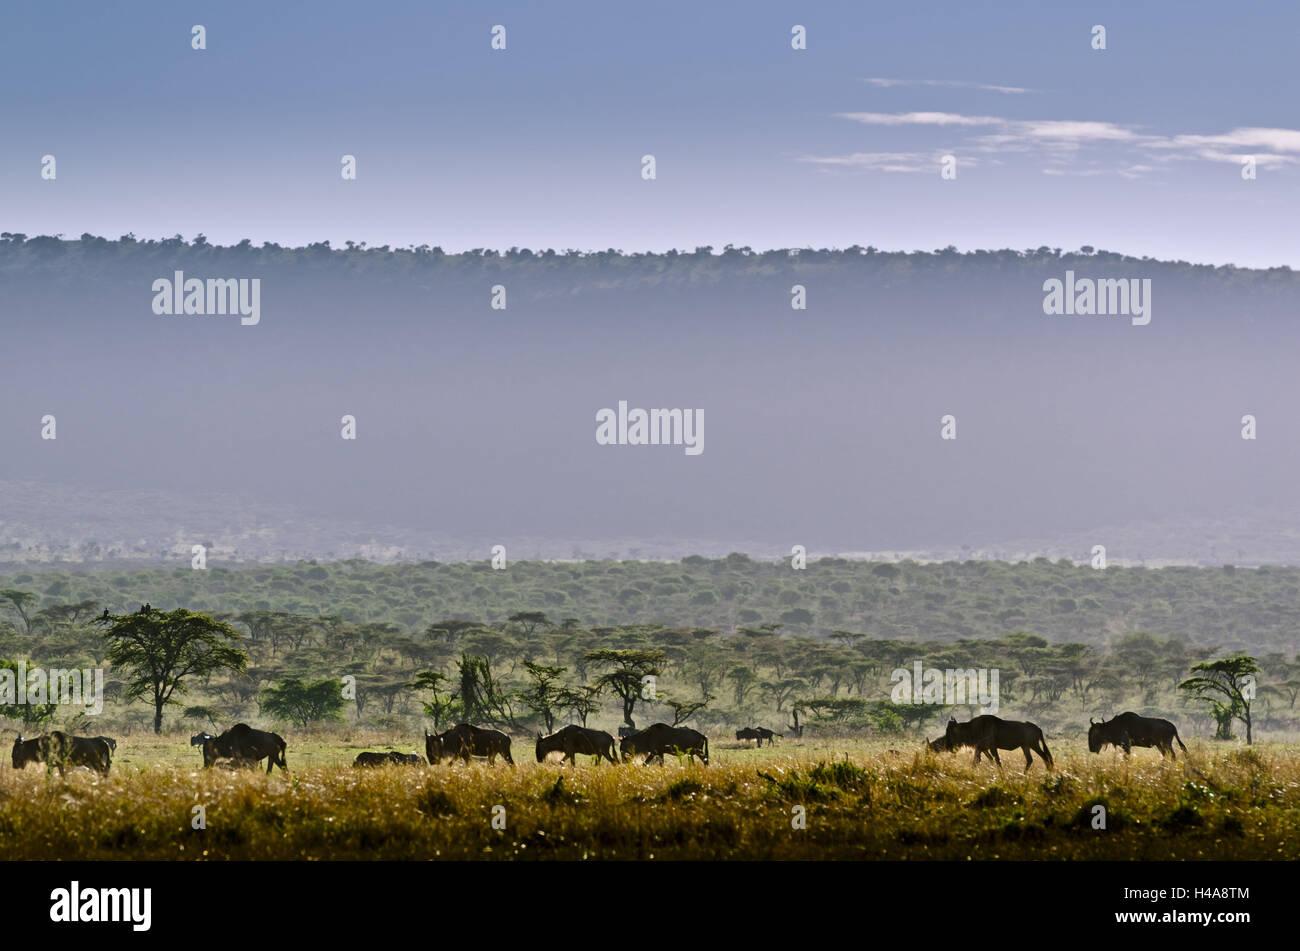 Africa Africa Orientale, Tanzania, Serengeti, mondo animale, gnus, Immagini Stock